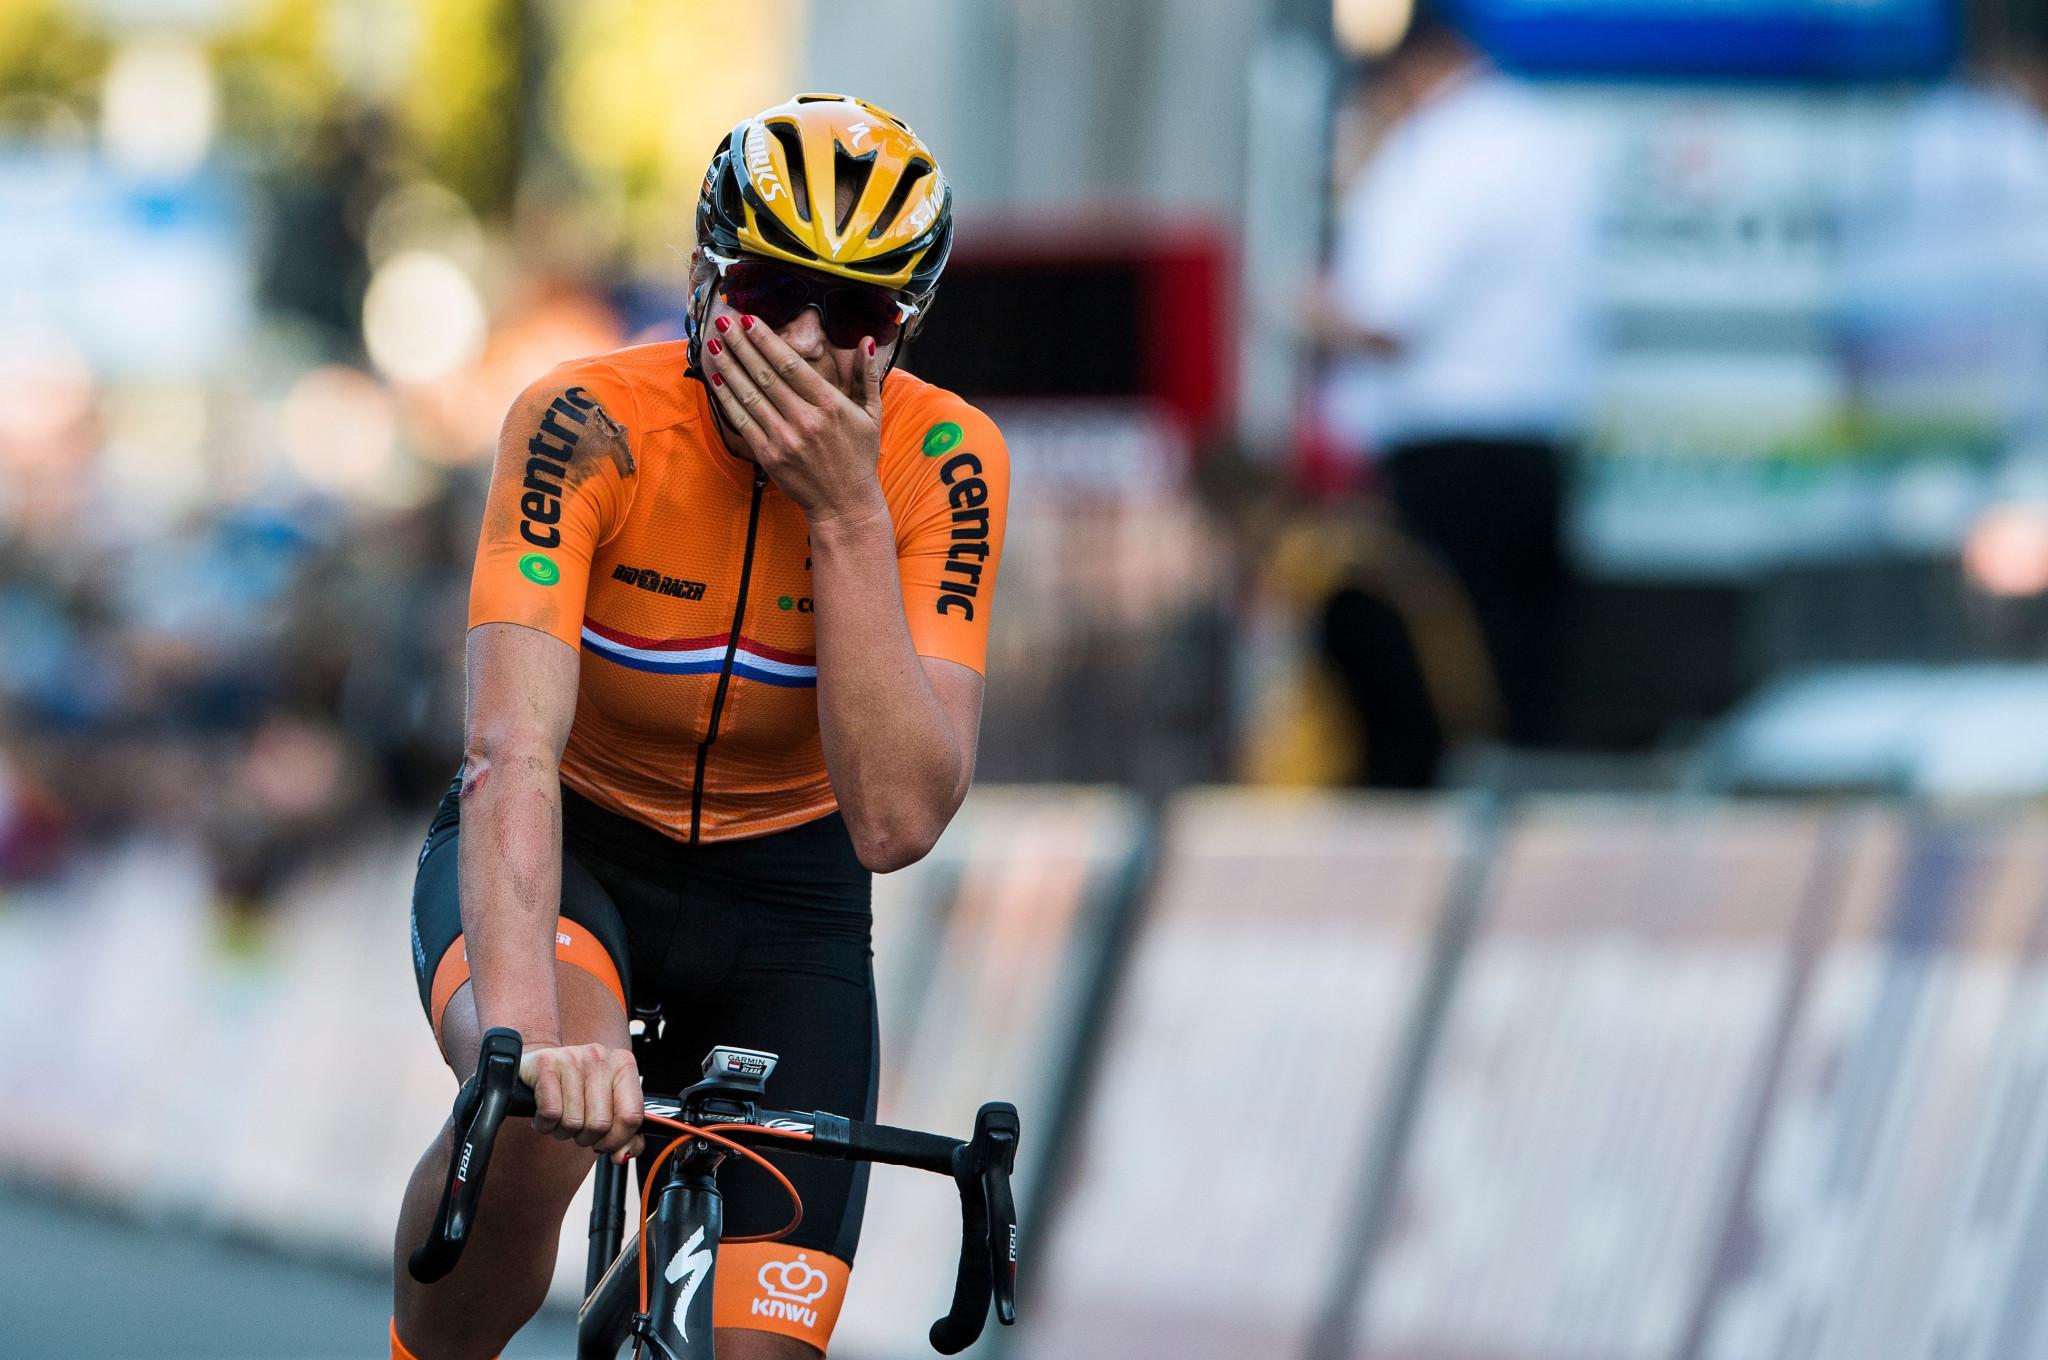 Blaak breaks clear to win women's elite title at UCI Road World Championships